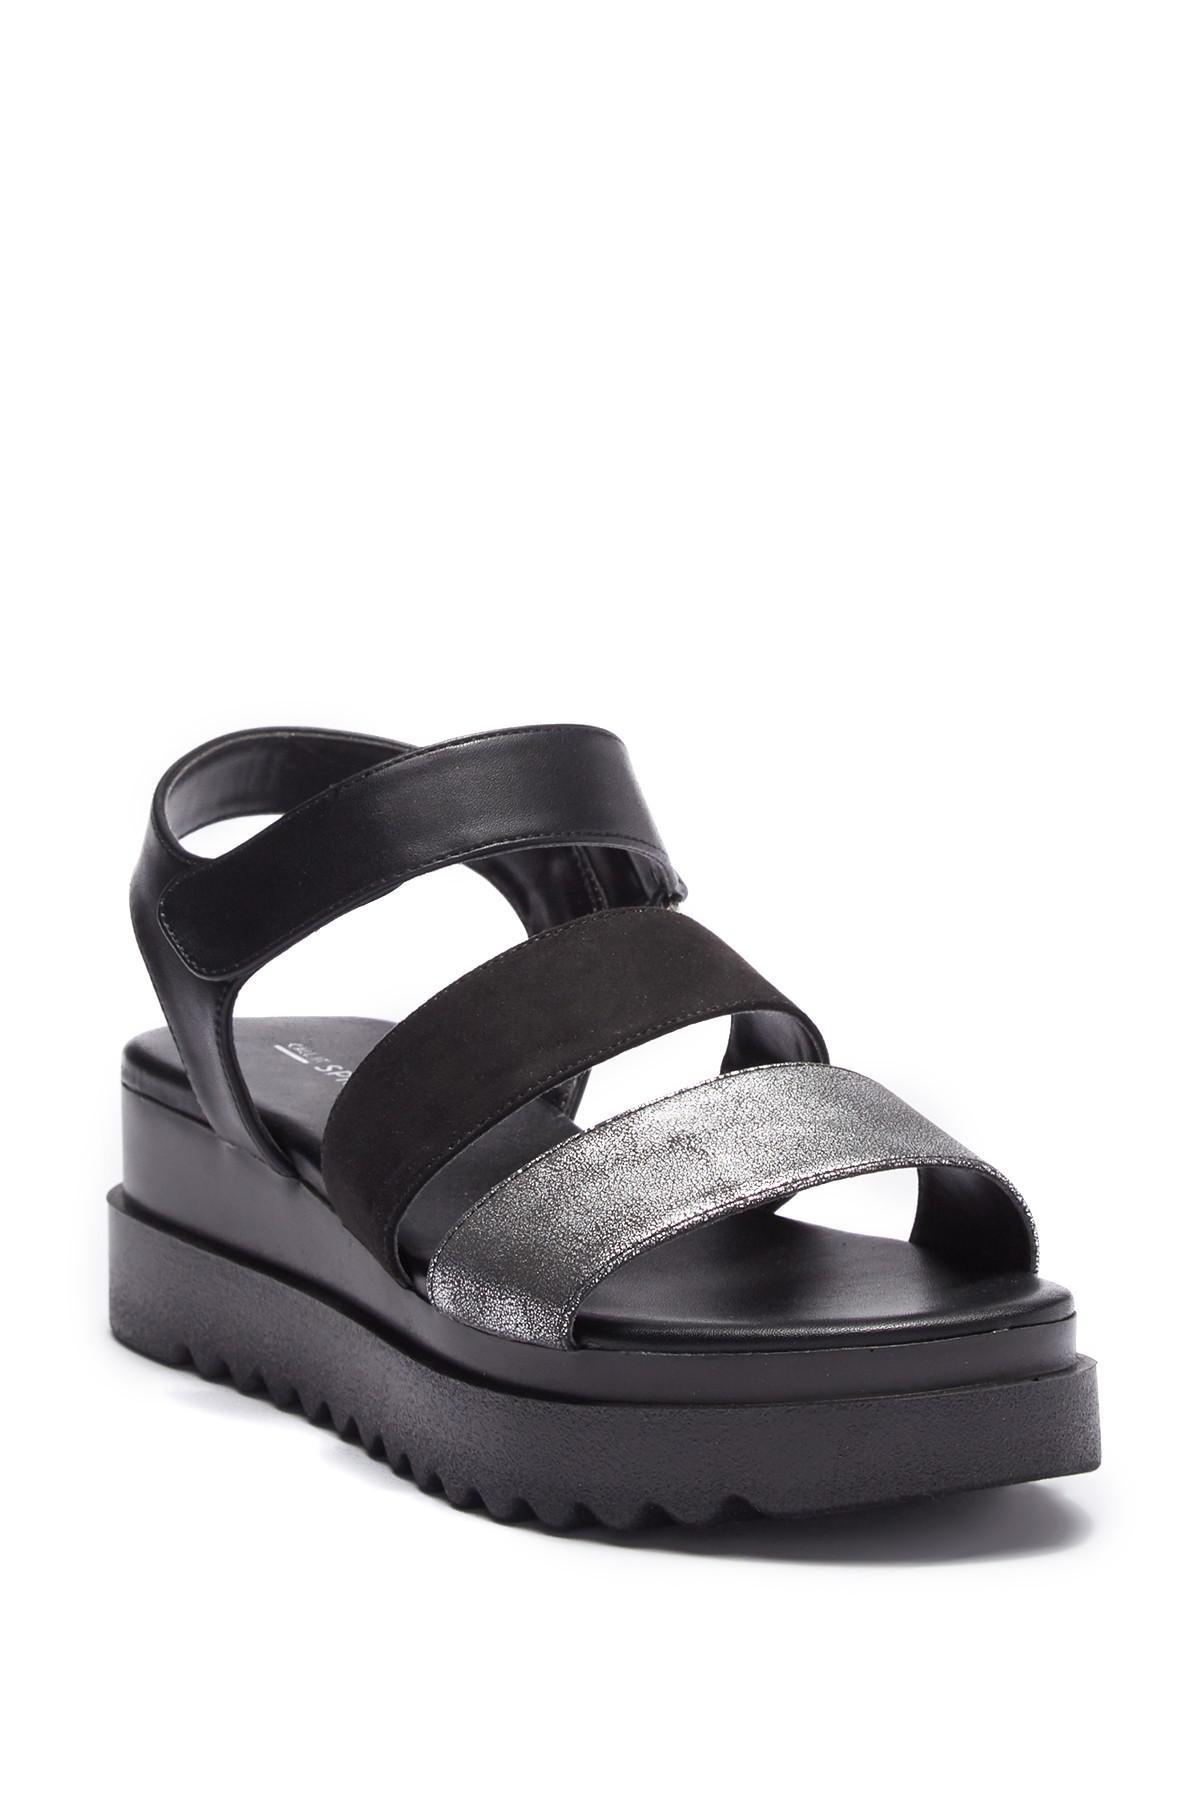 7892190d986 Lyst - Call It Spring Yboreni Platform Sandal in Black